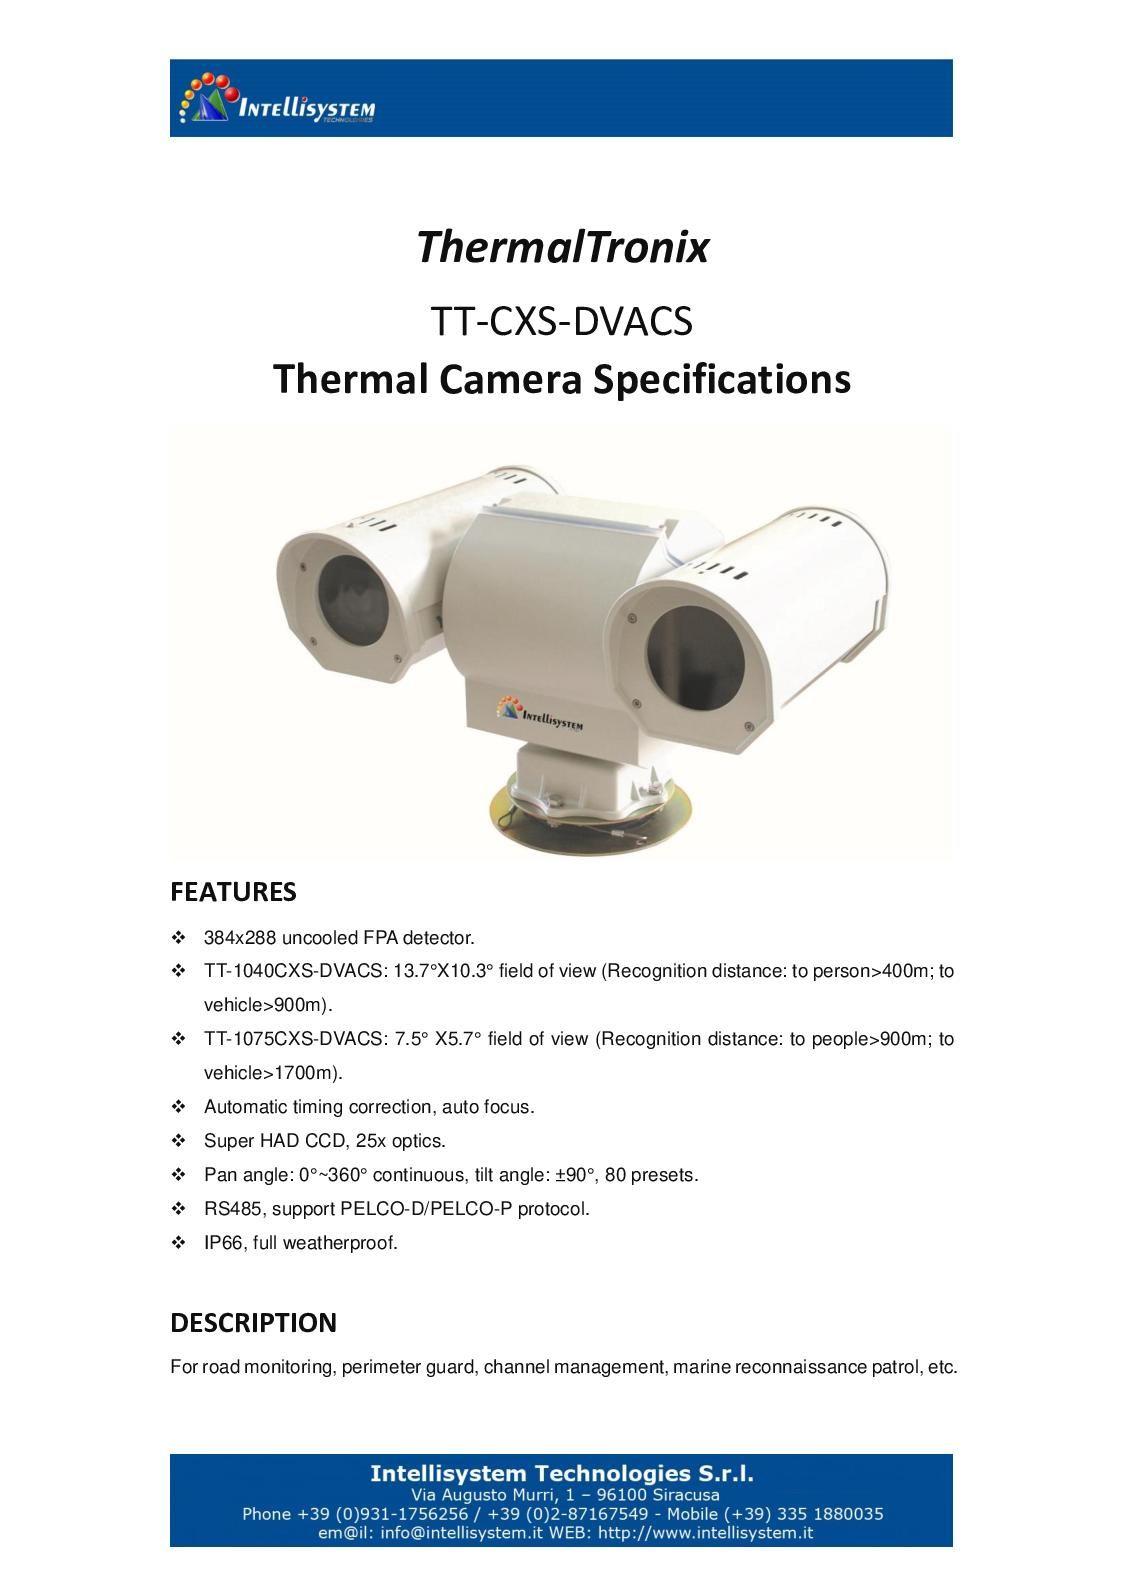 Thermal Tronix Tt Cxs Dvacs Datasheet - SECURITY SYSTEMS